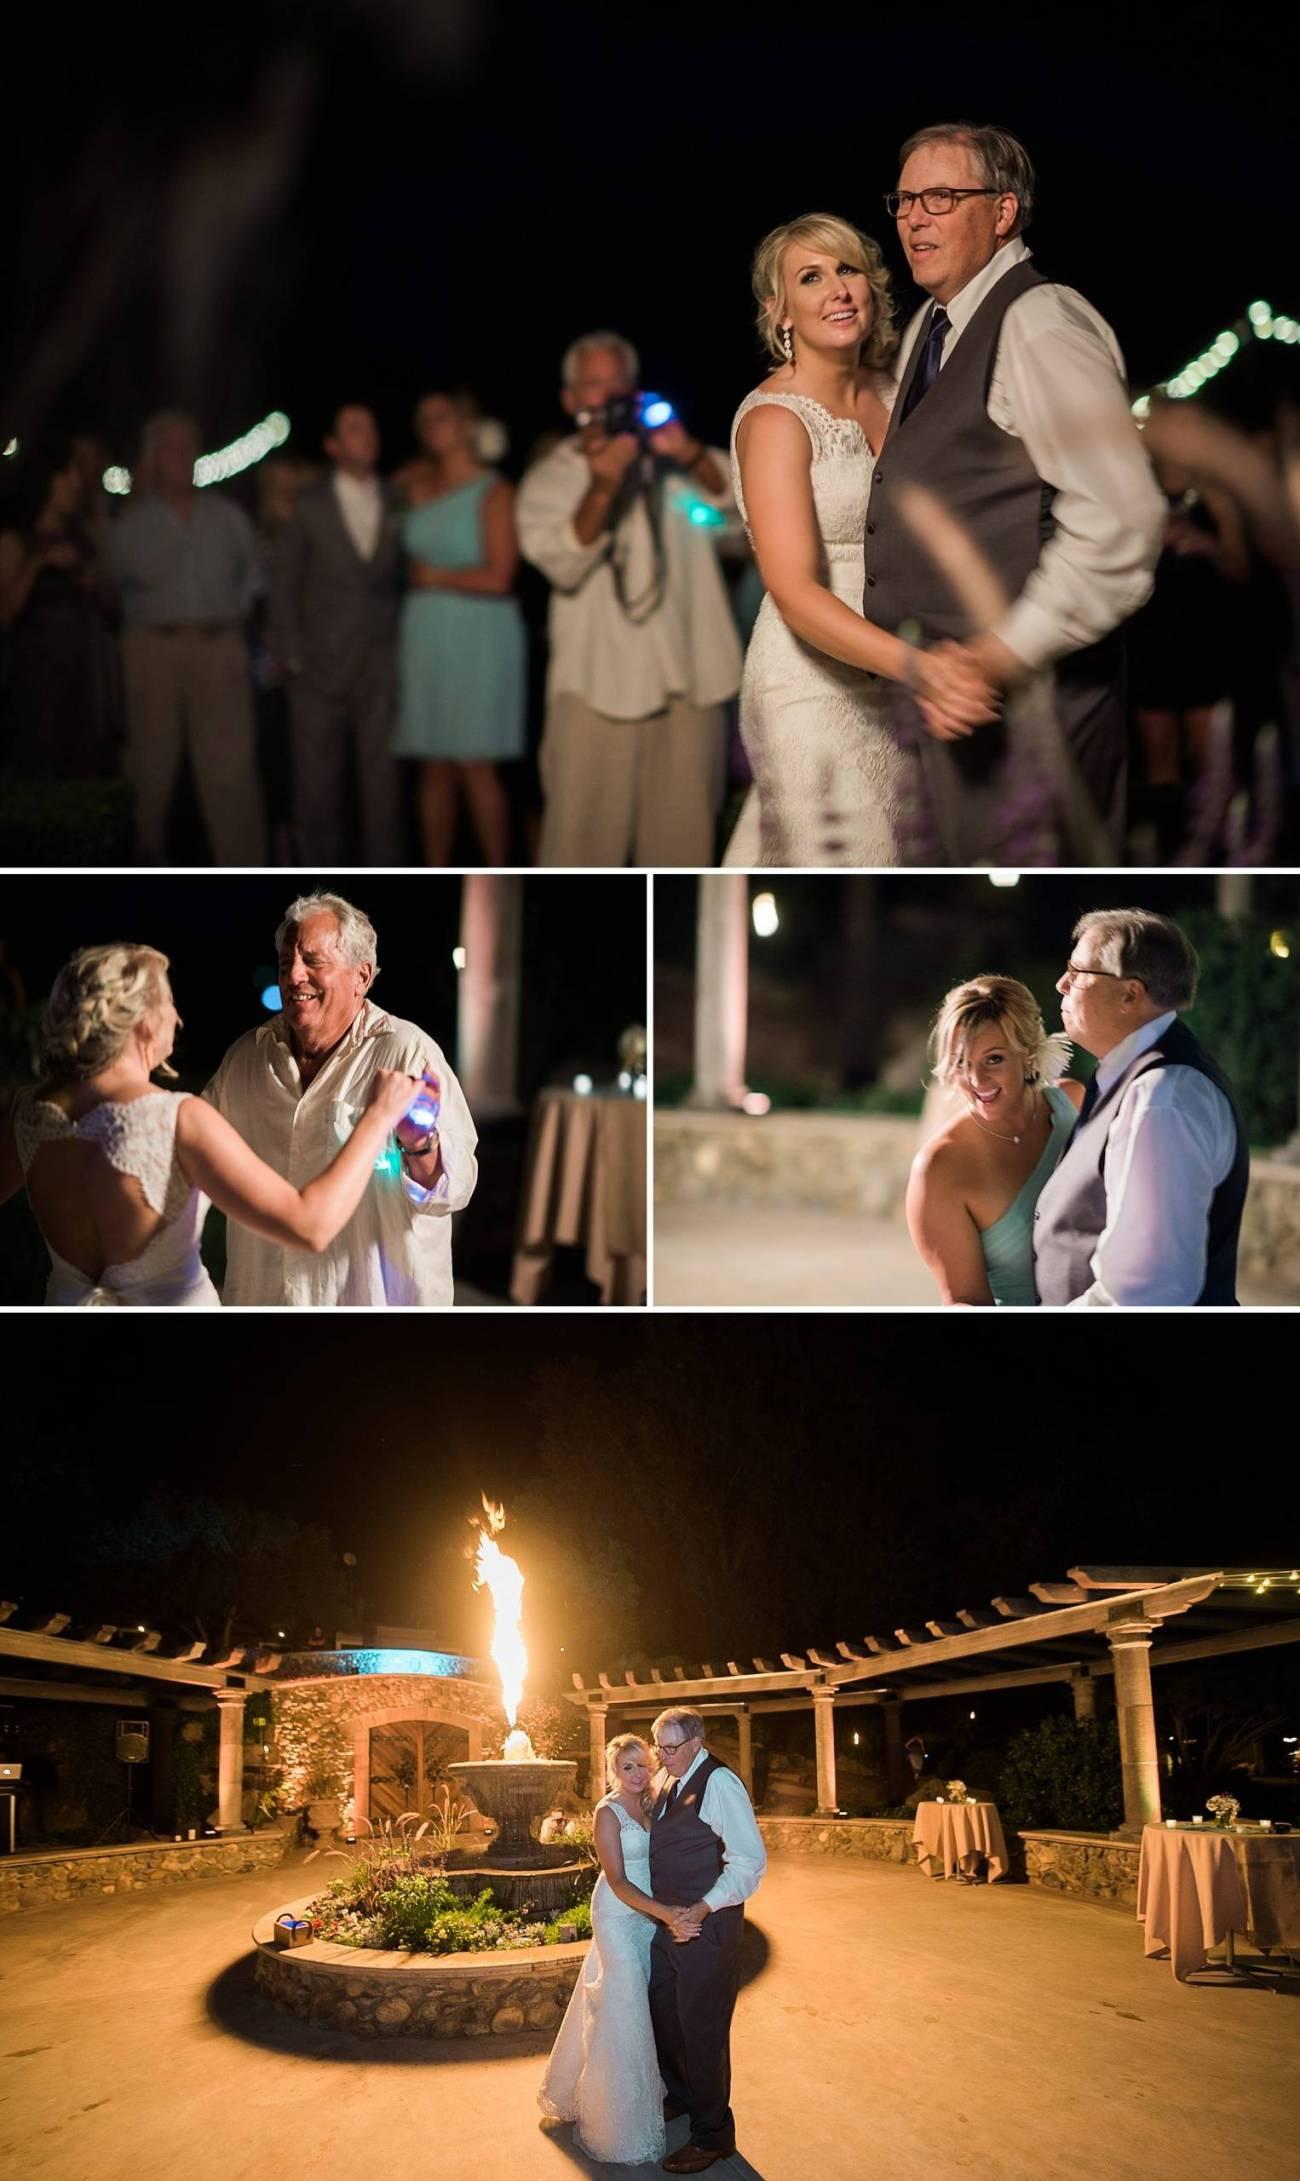 Erin + Marcel Third Element Photography & Cinema Fresno County Estate Wedding Hybrid Film Wedding Photographer_0057